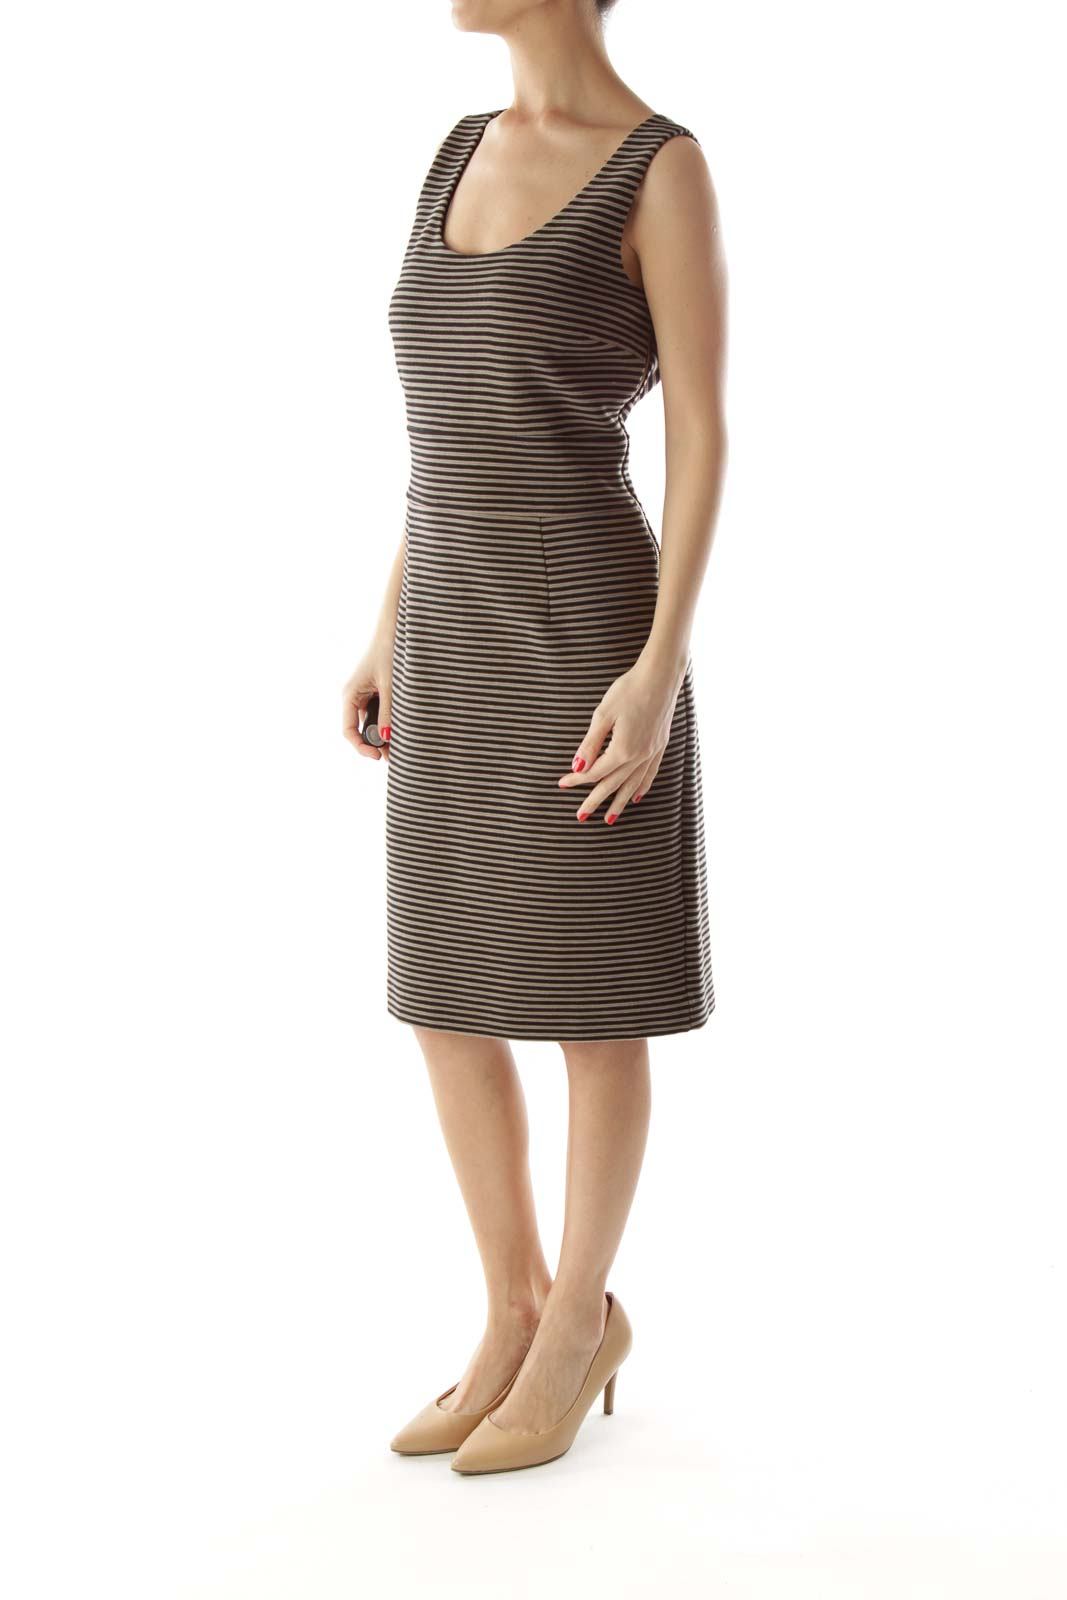 Black & Gray Striped Dress